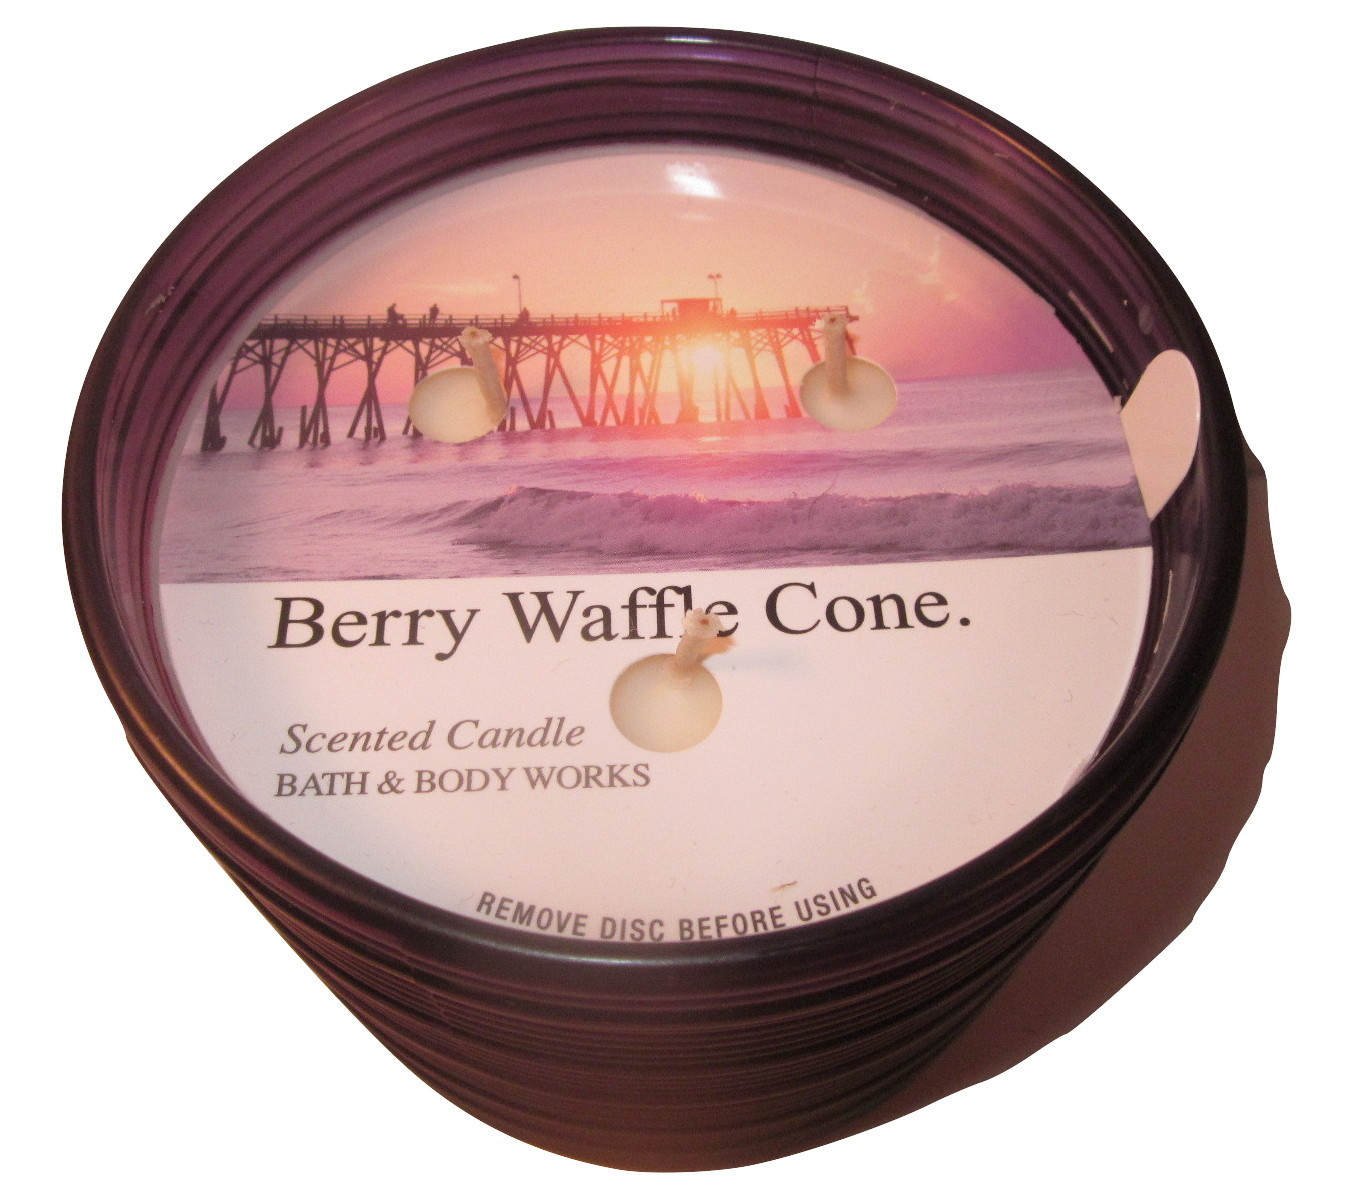 Bath & Body Works 3 wick 14.5 oz Candle Purple Spun Glass  Berry Waffle Cone